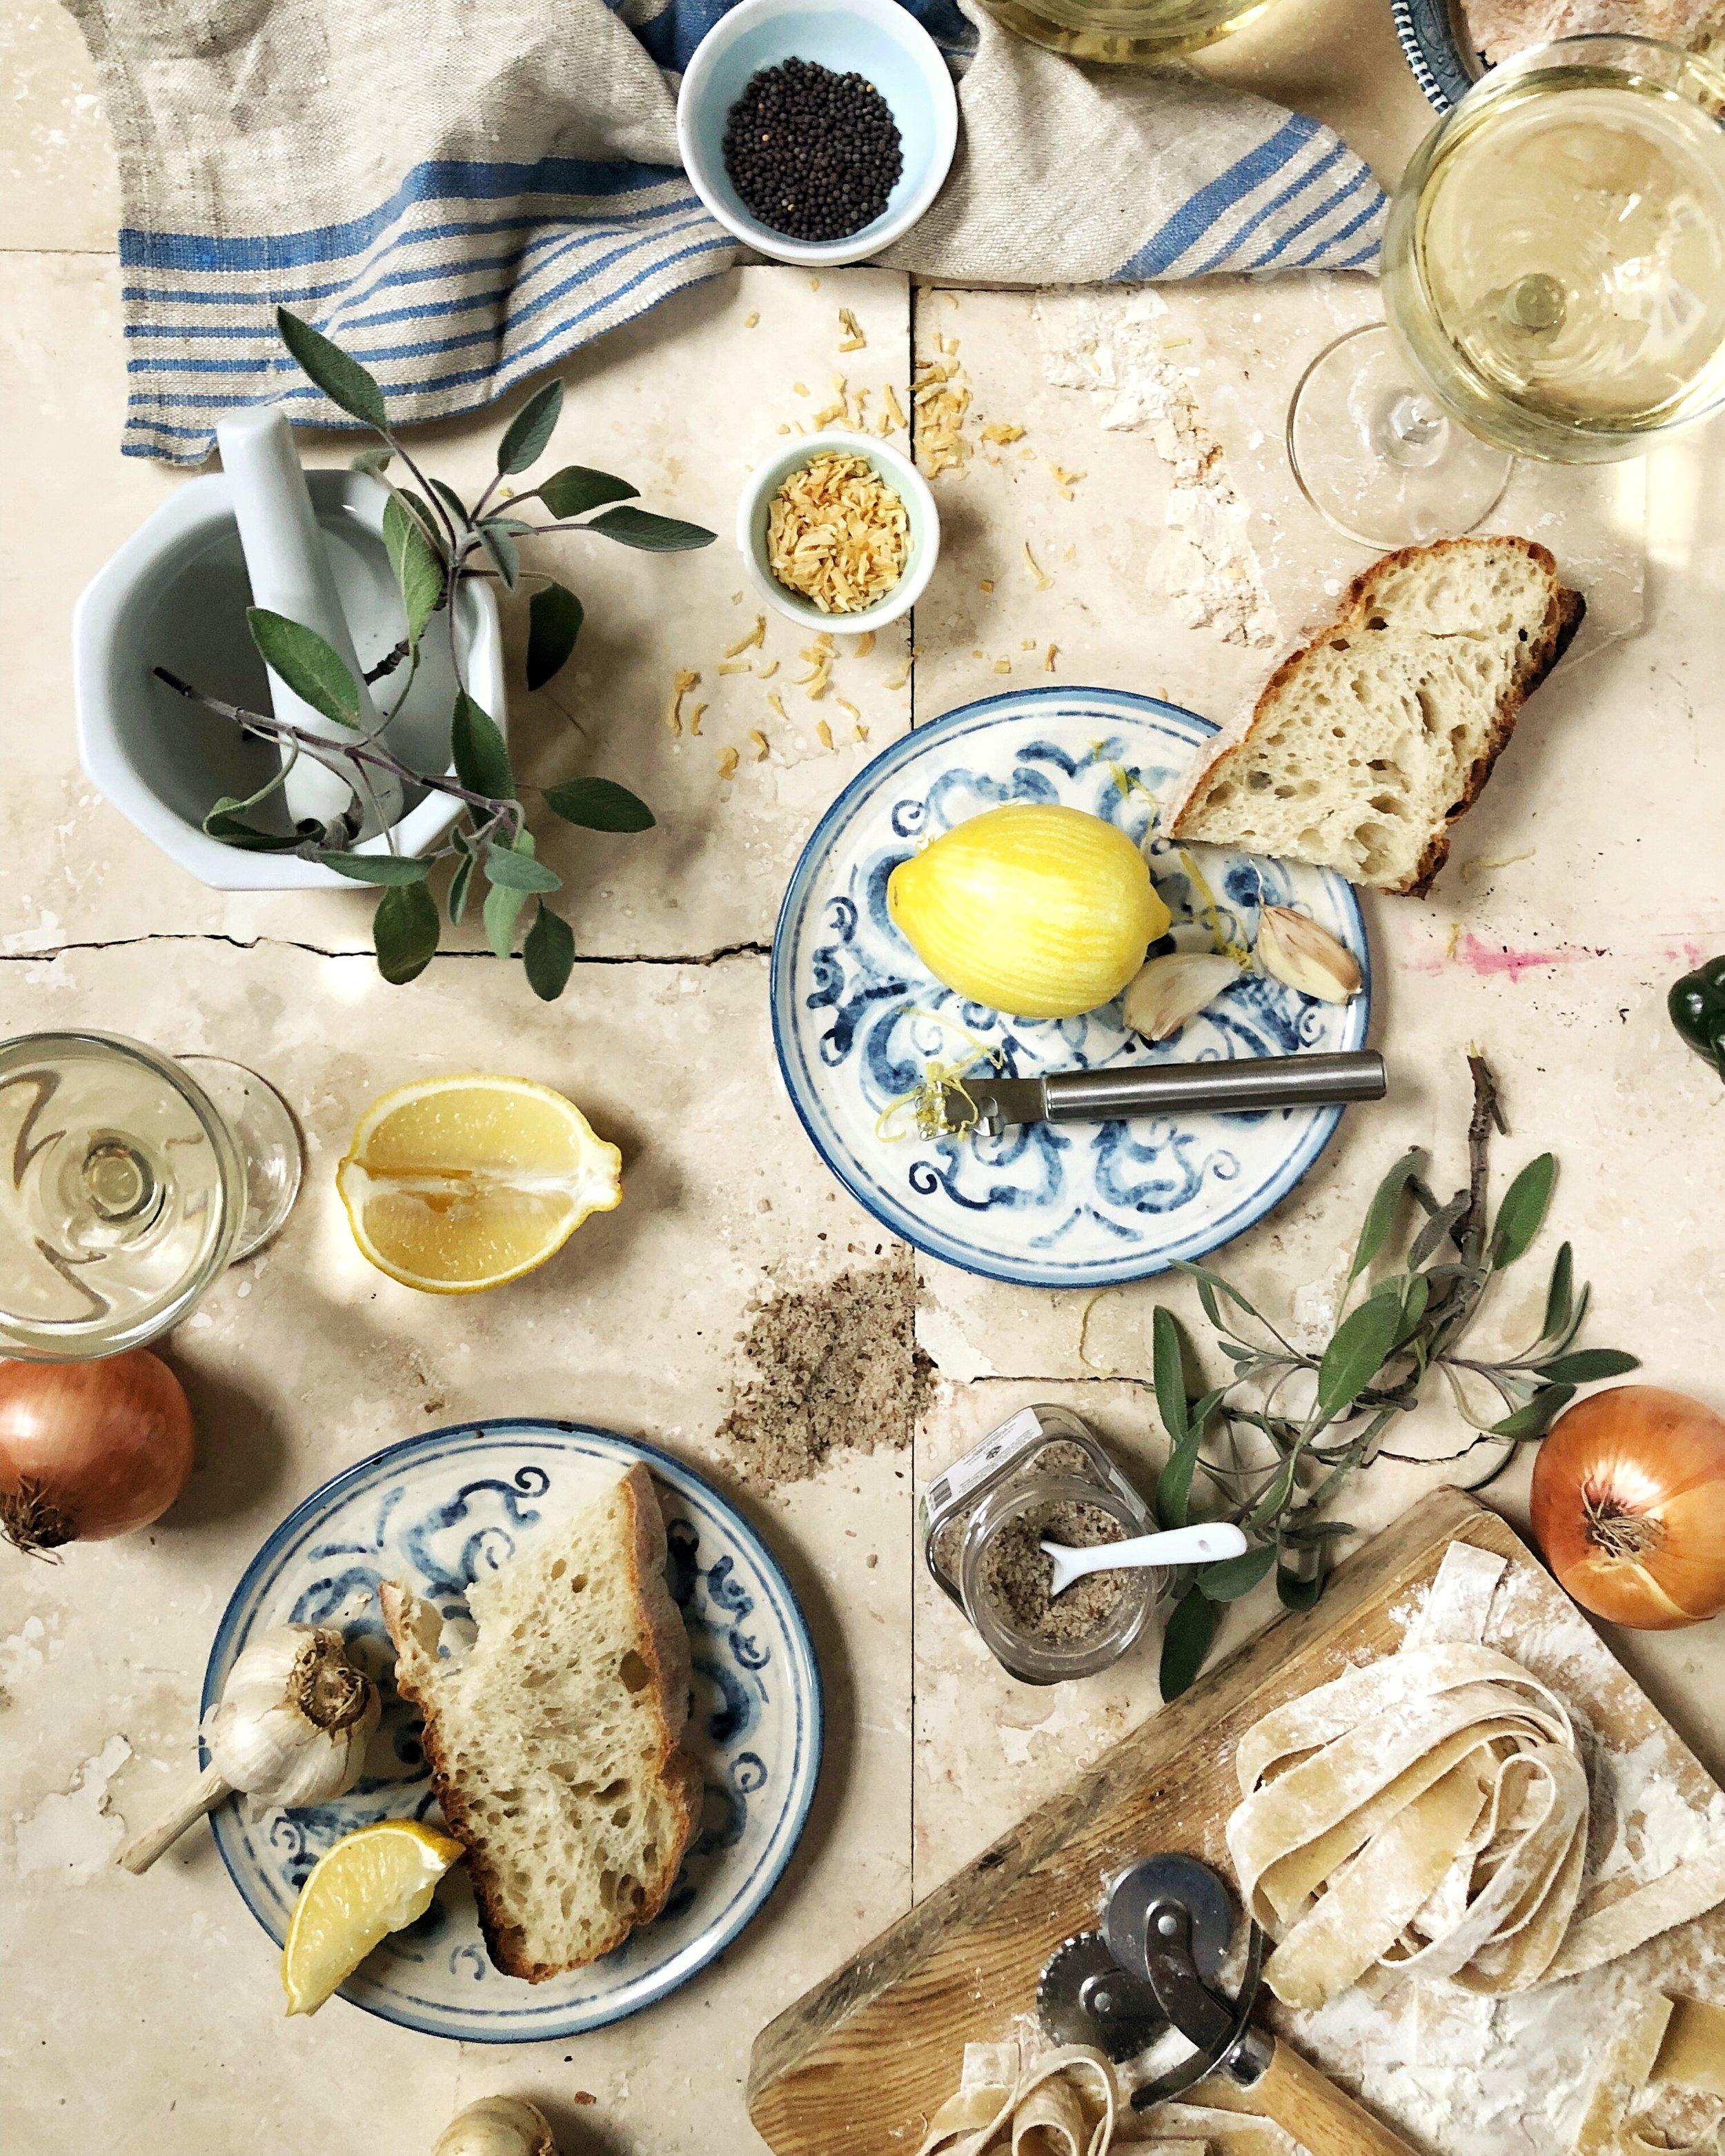 ROSE & IVY Journal Holiday Gifting Sicilian Sunshine